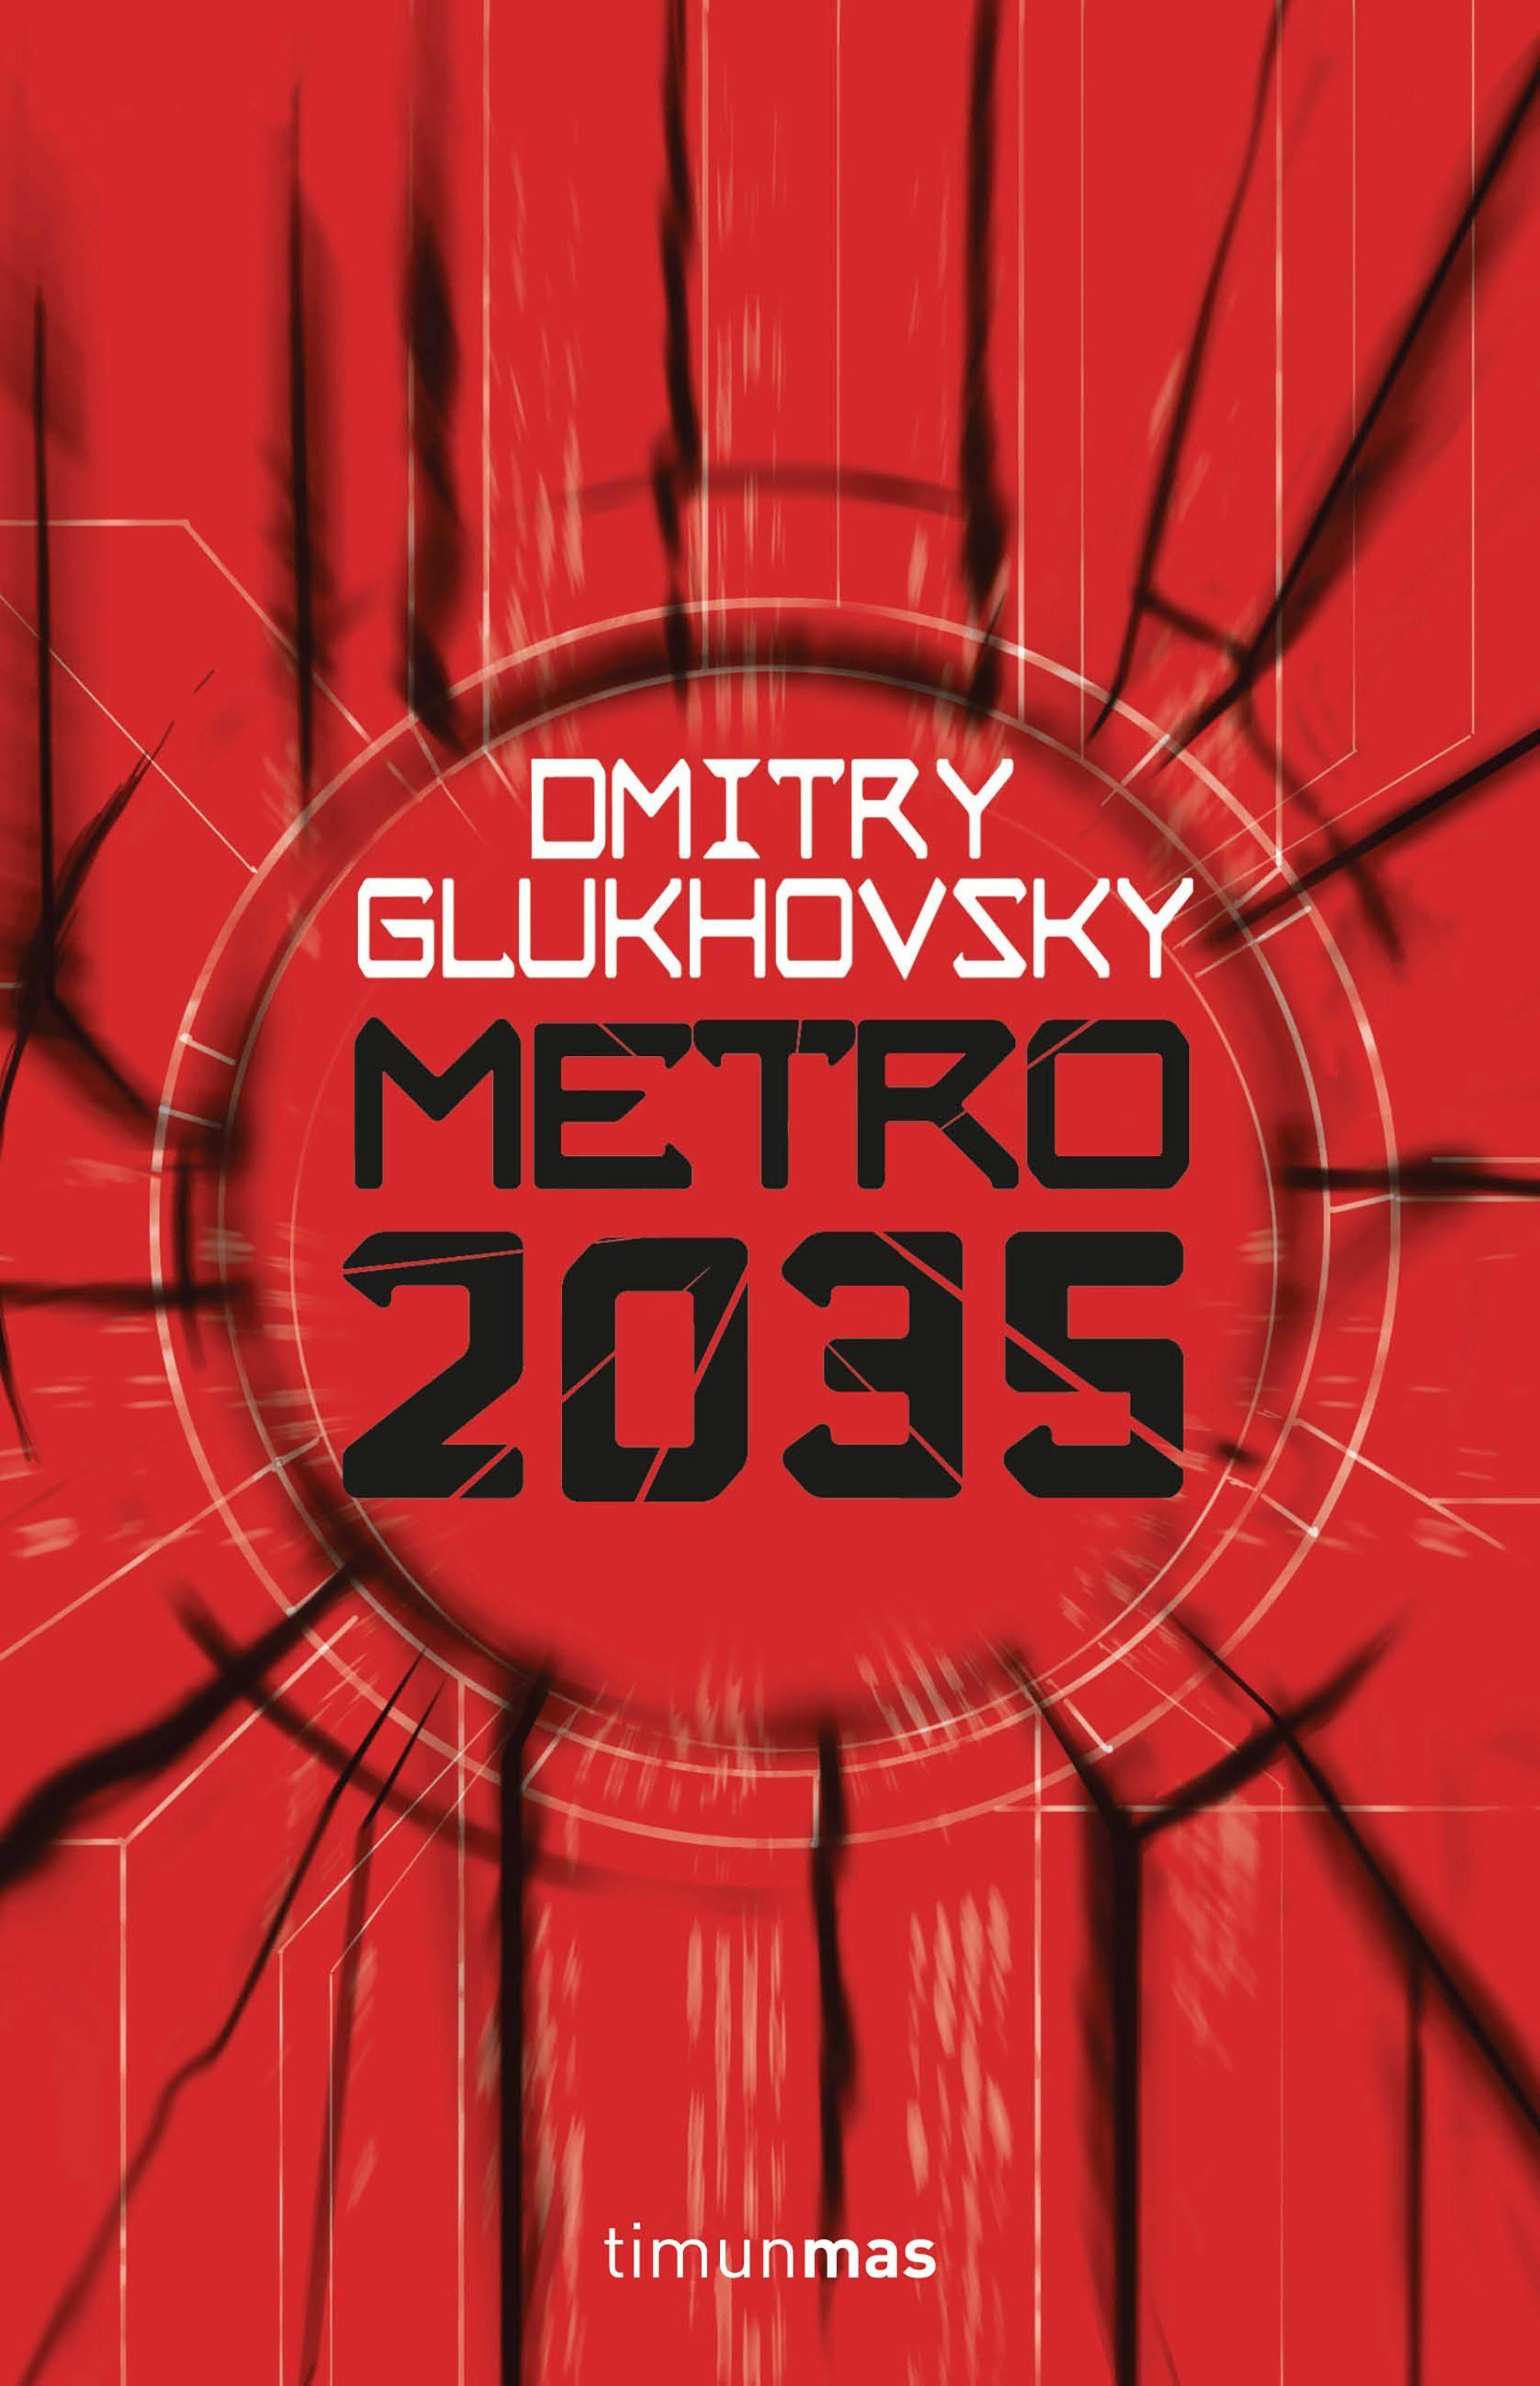 Metro 2035 - Dmitry Glukhovsky (Metro III) 9788445004012